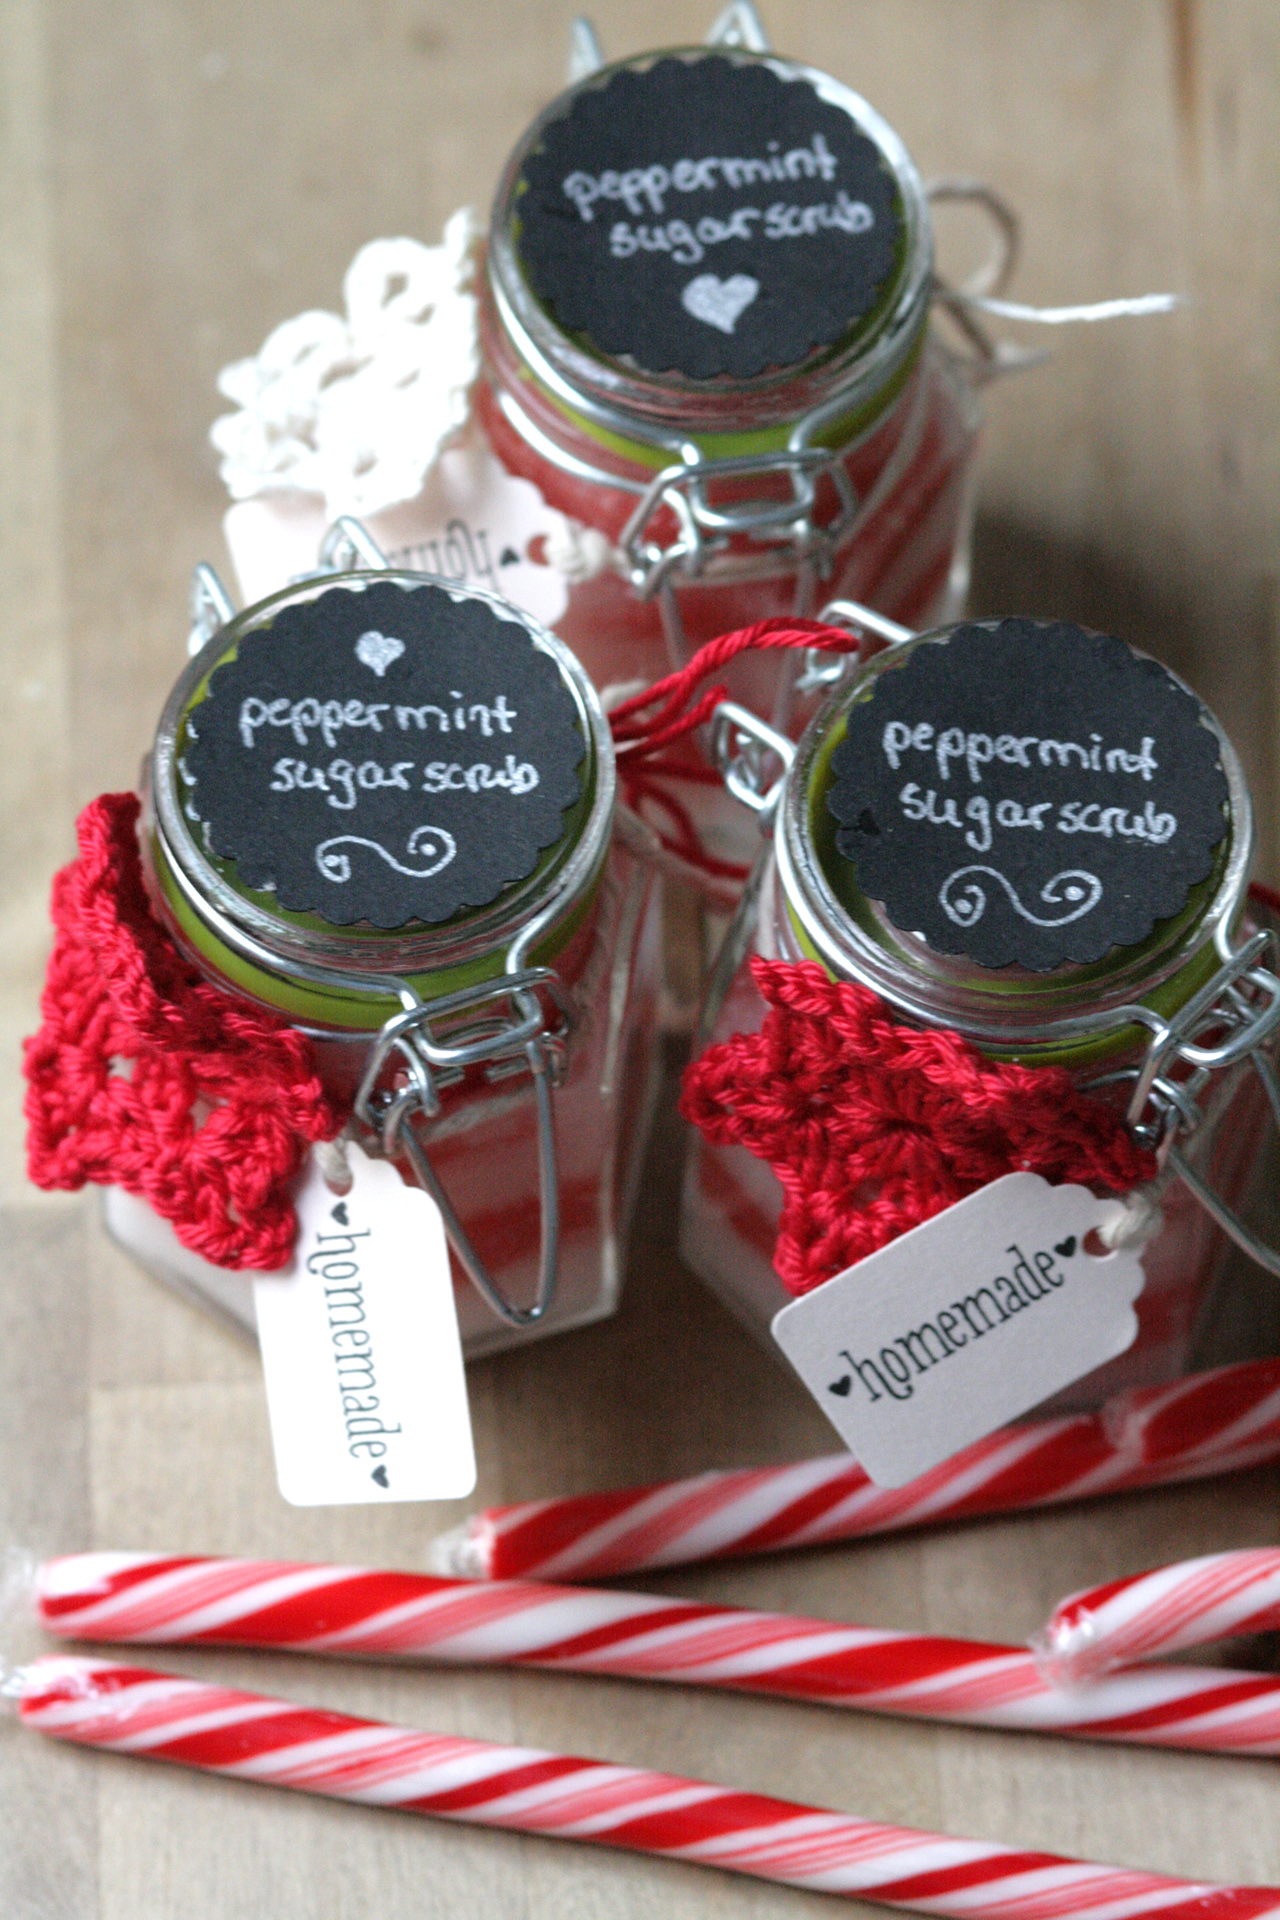 Peppermint Sugar Scrub Packaging